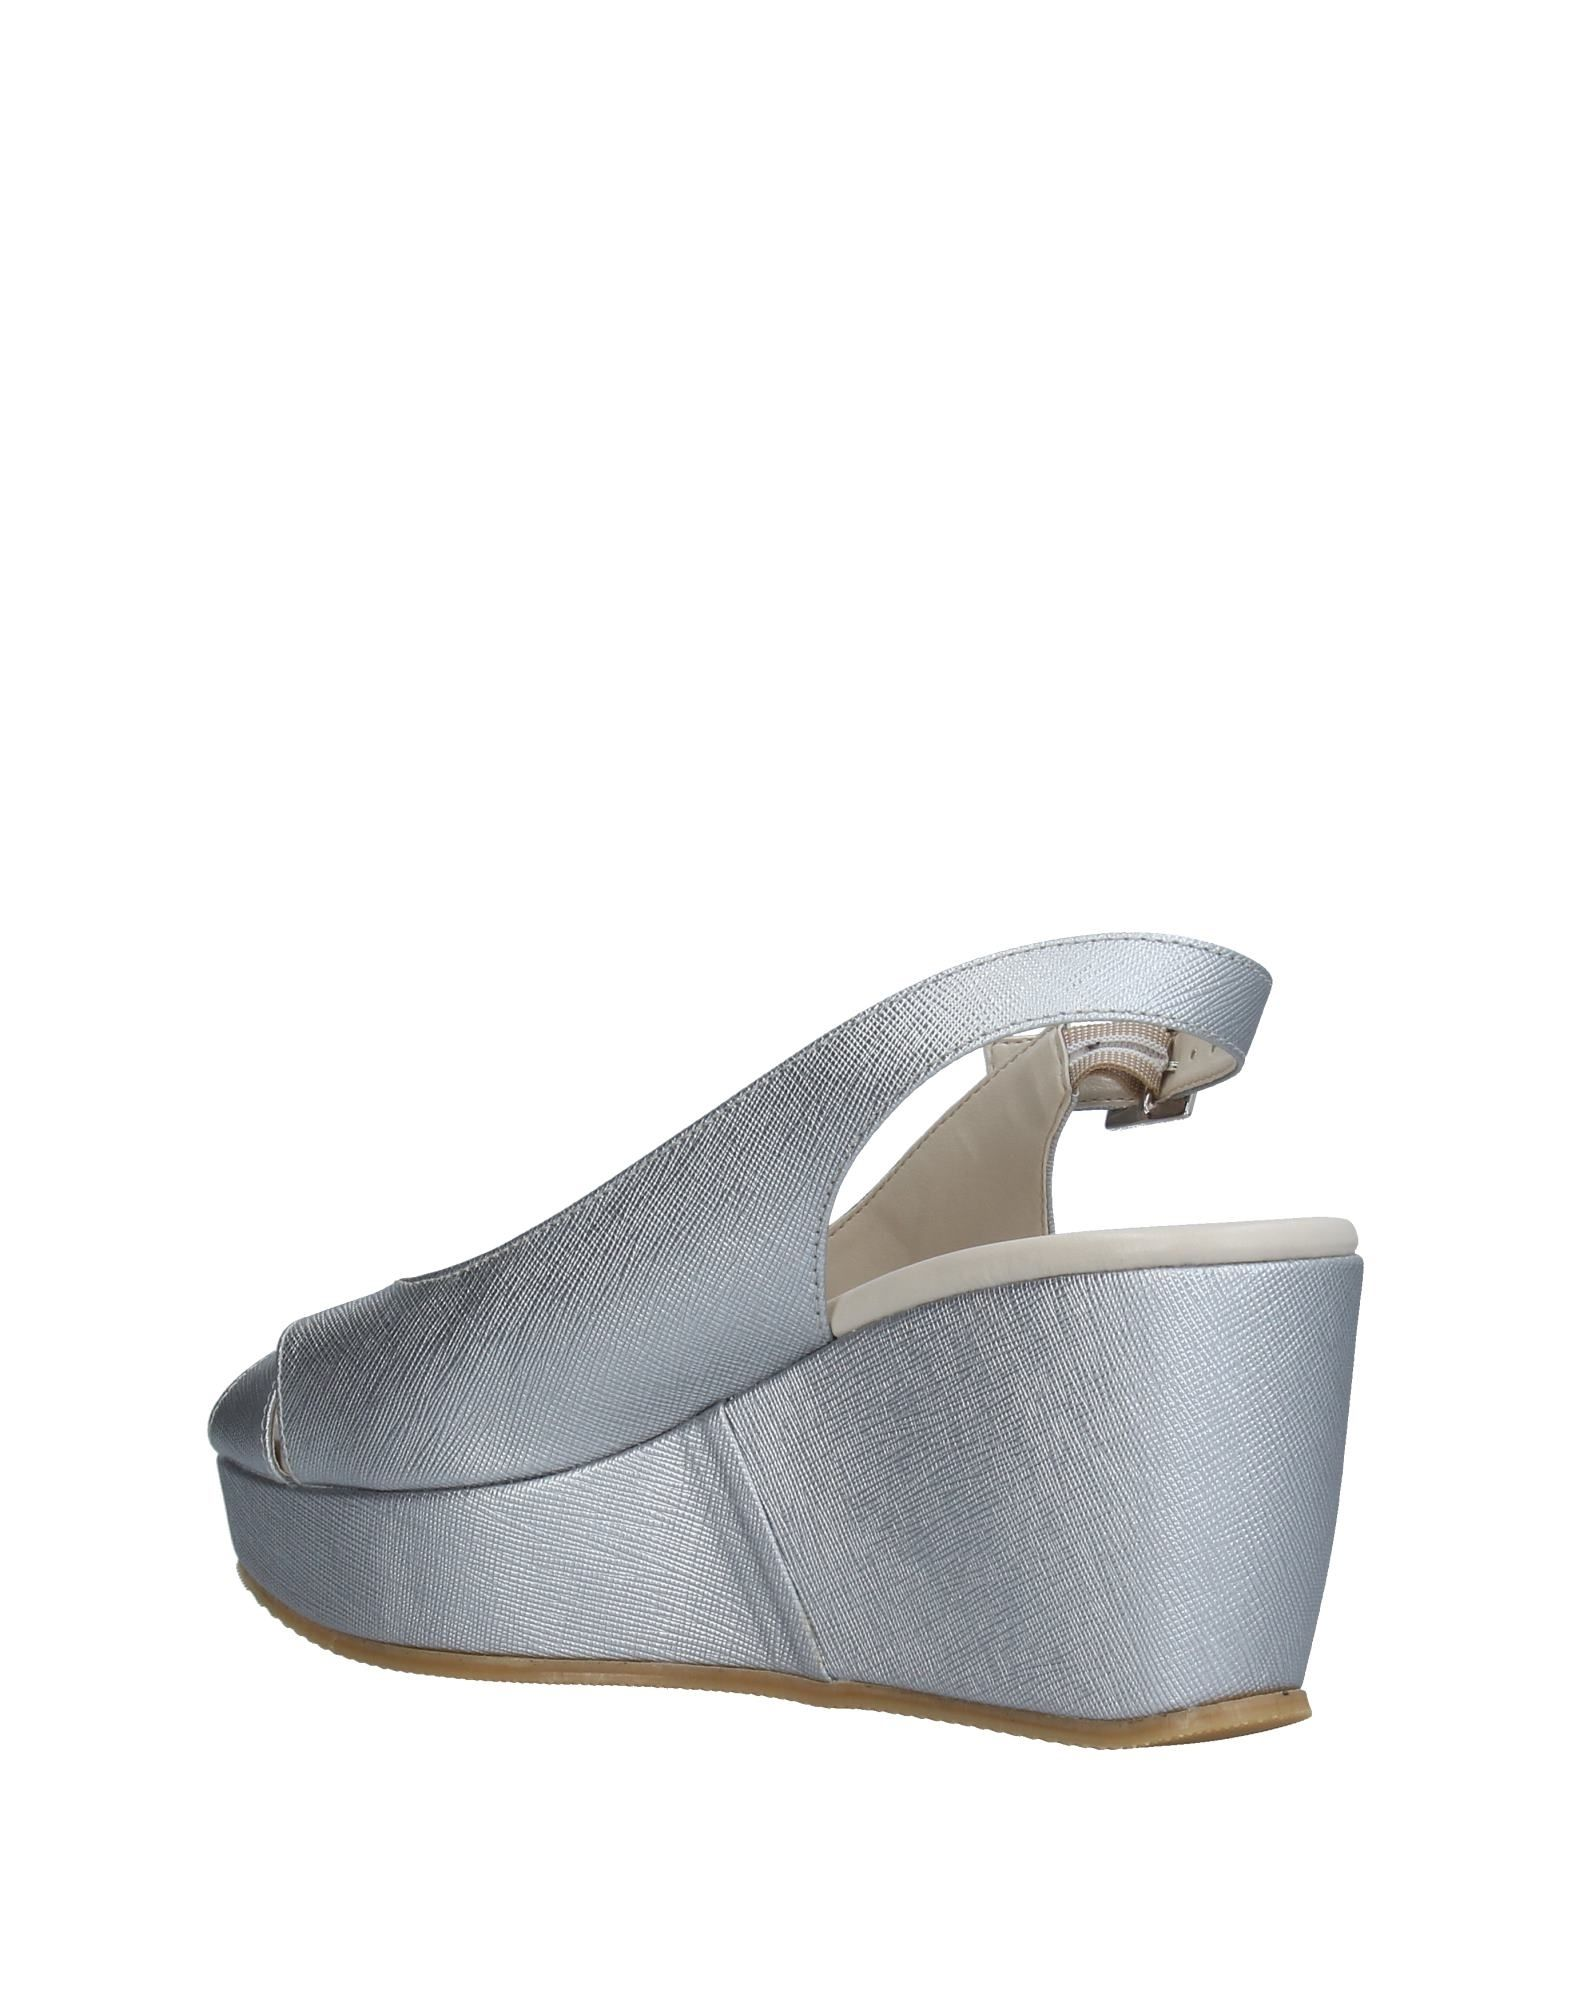 Sandales Agile By Rucoline Femme - Sandales Agile By Rucoline sur